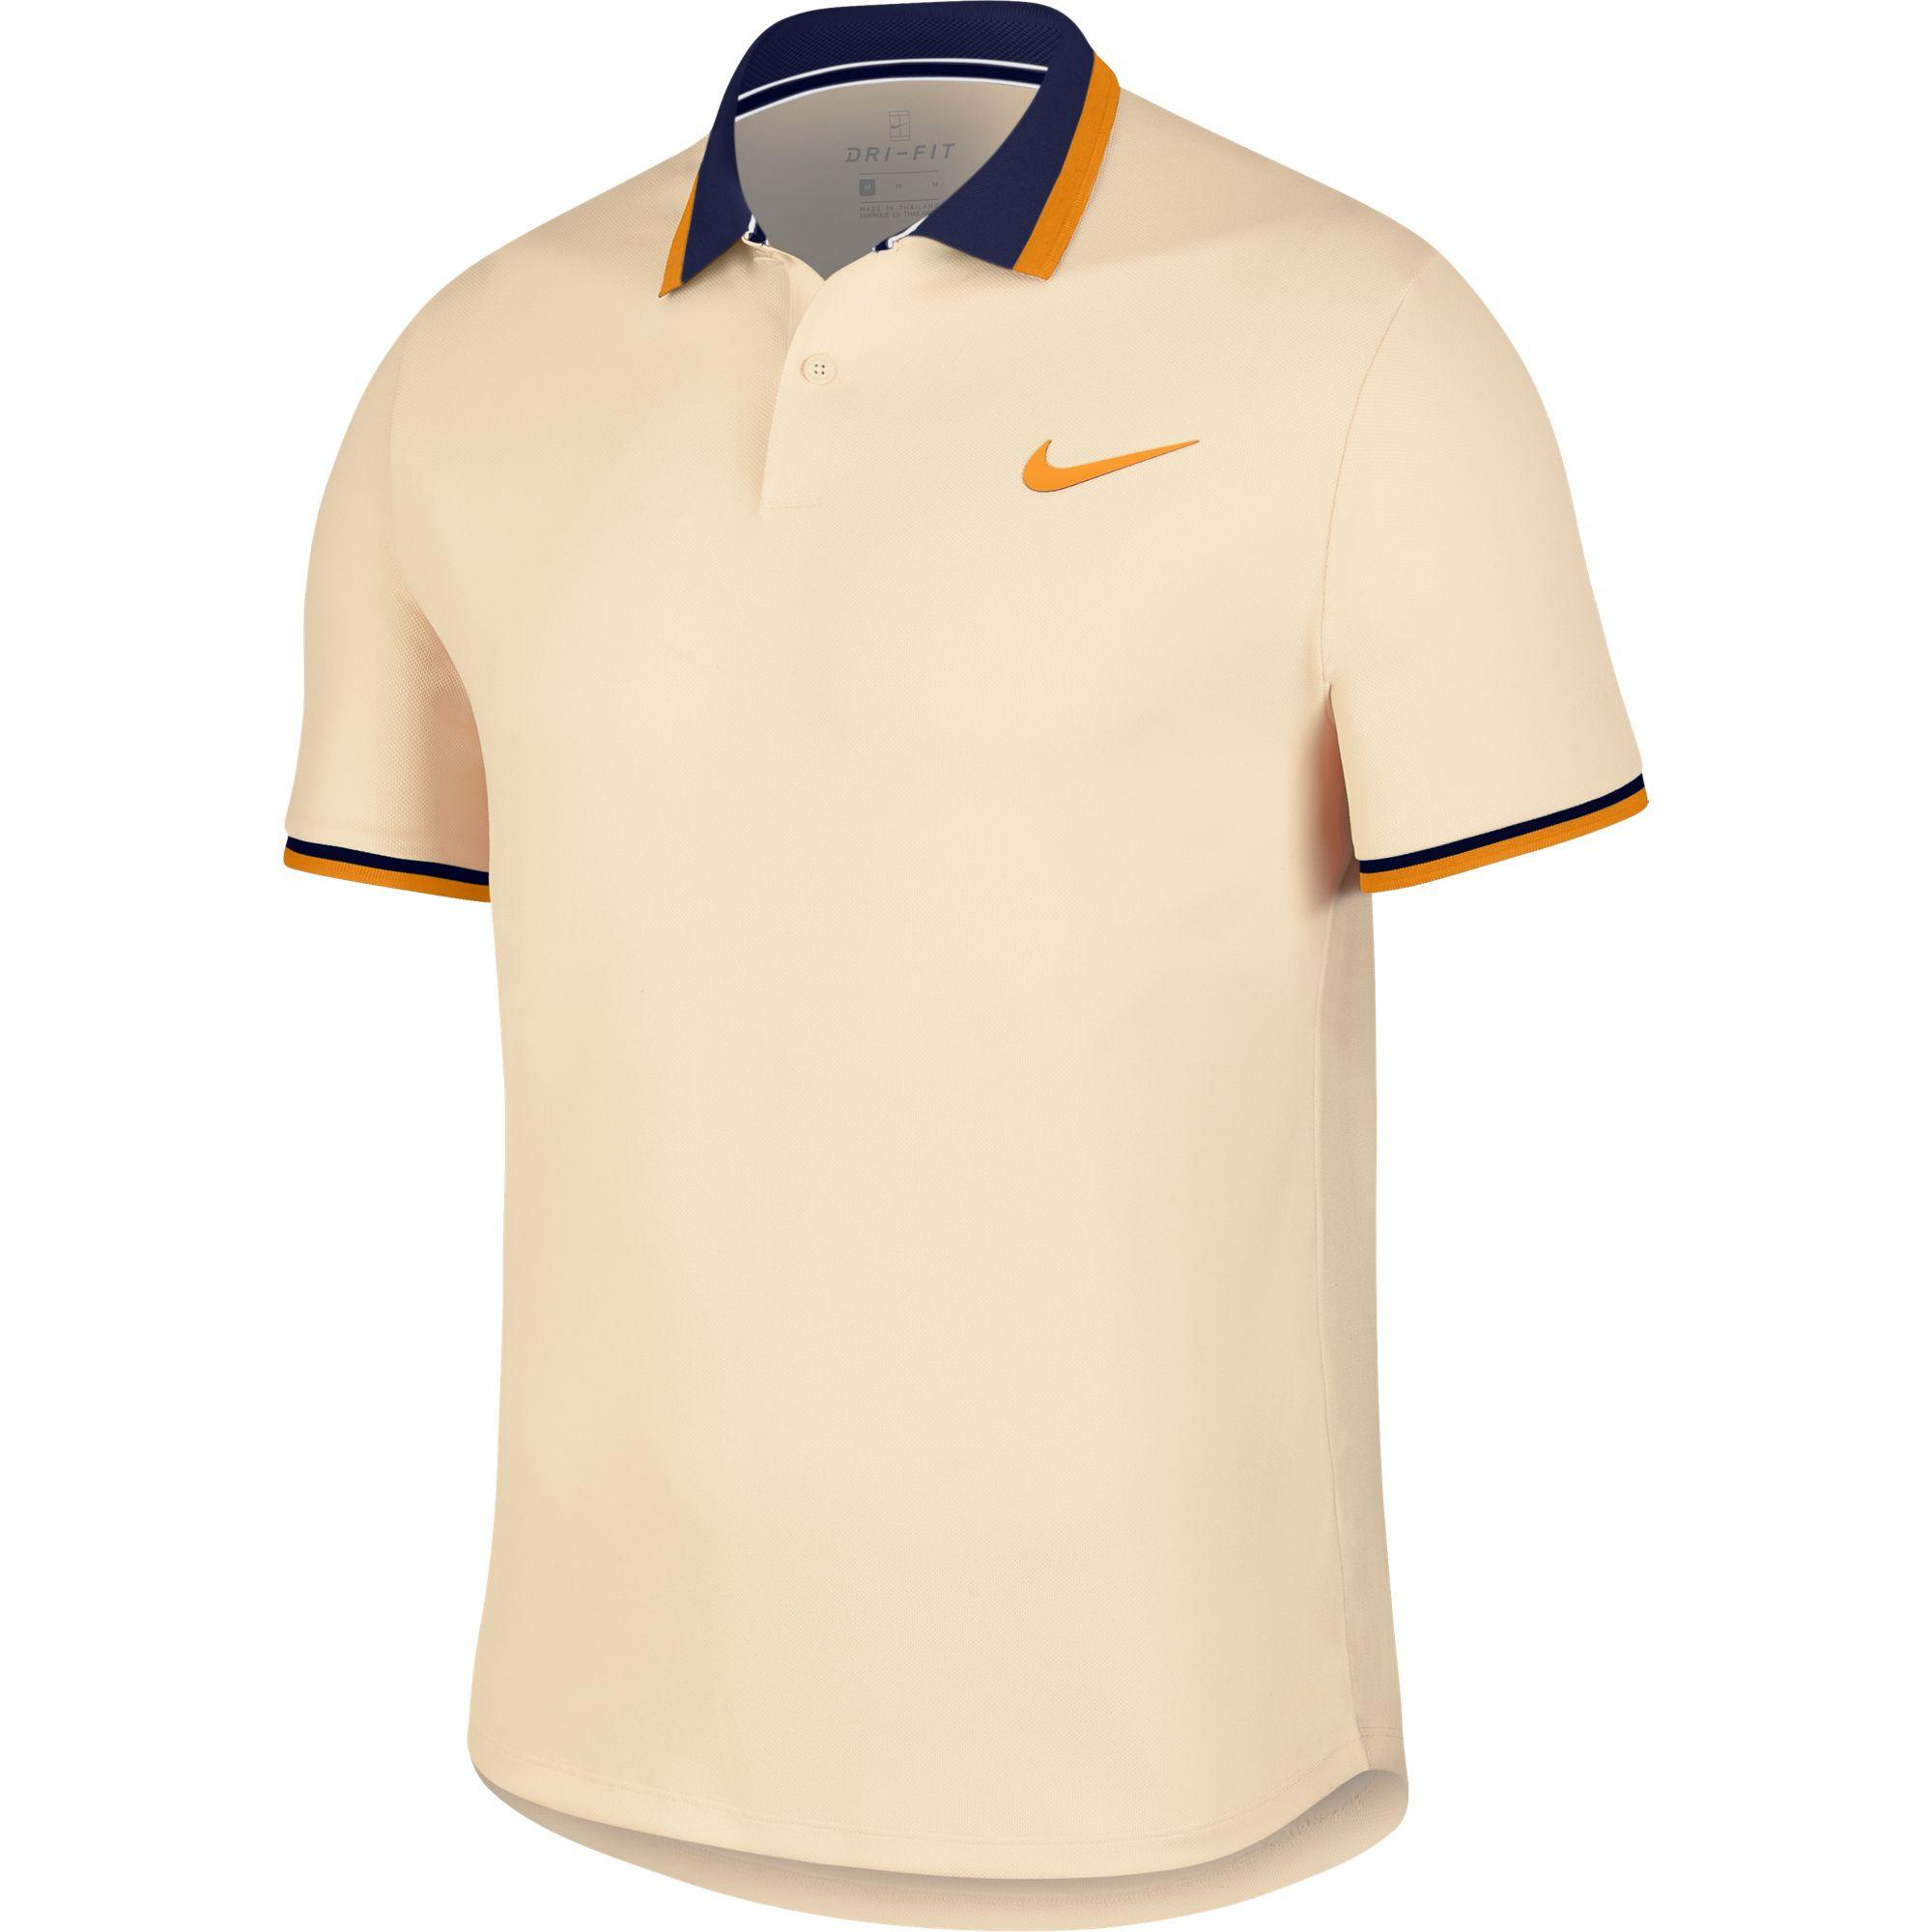 4c6806923 Nike Mens Advantage Tennis Polo - Guava Ice/Blue Void/Orange Peel -  Tennisnuts.com